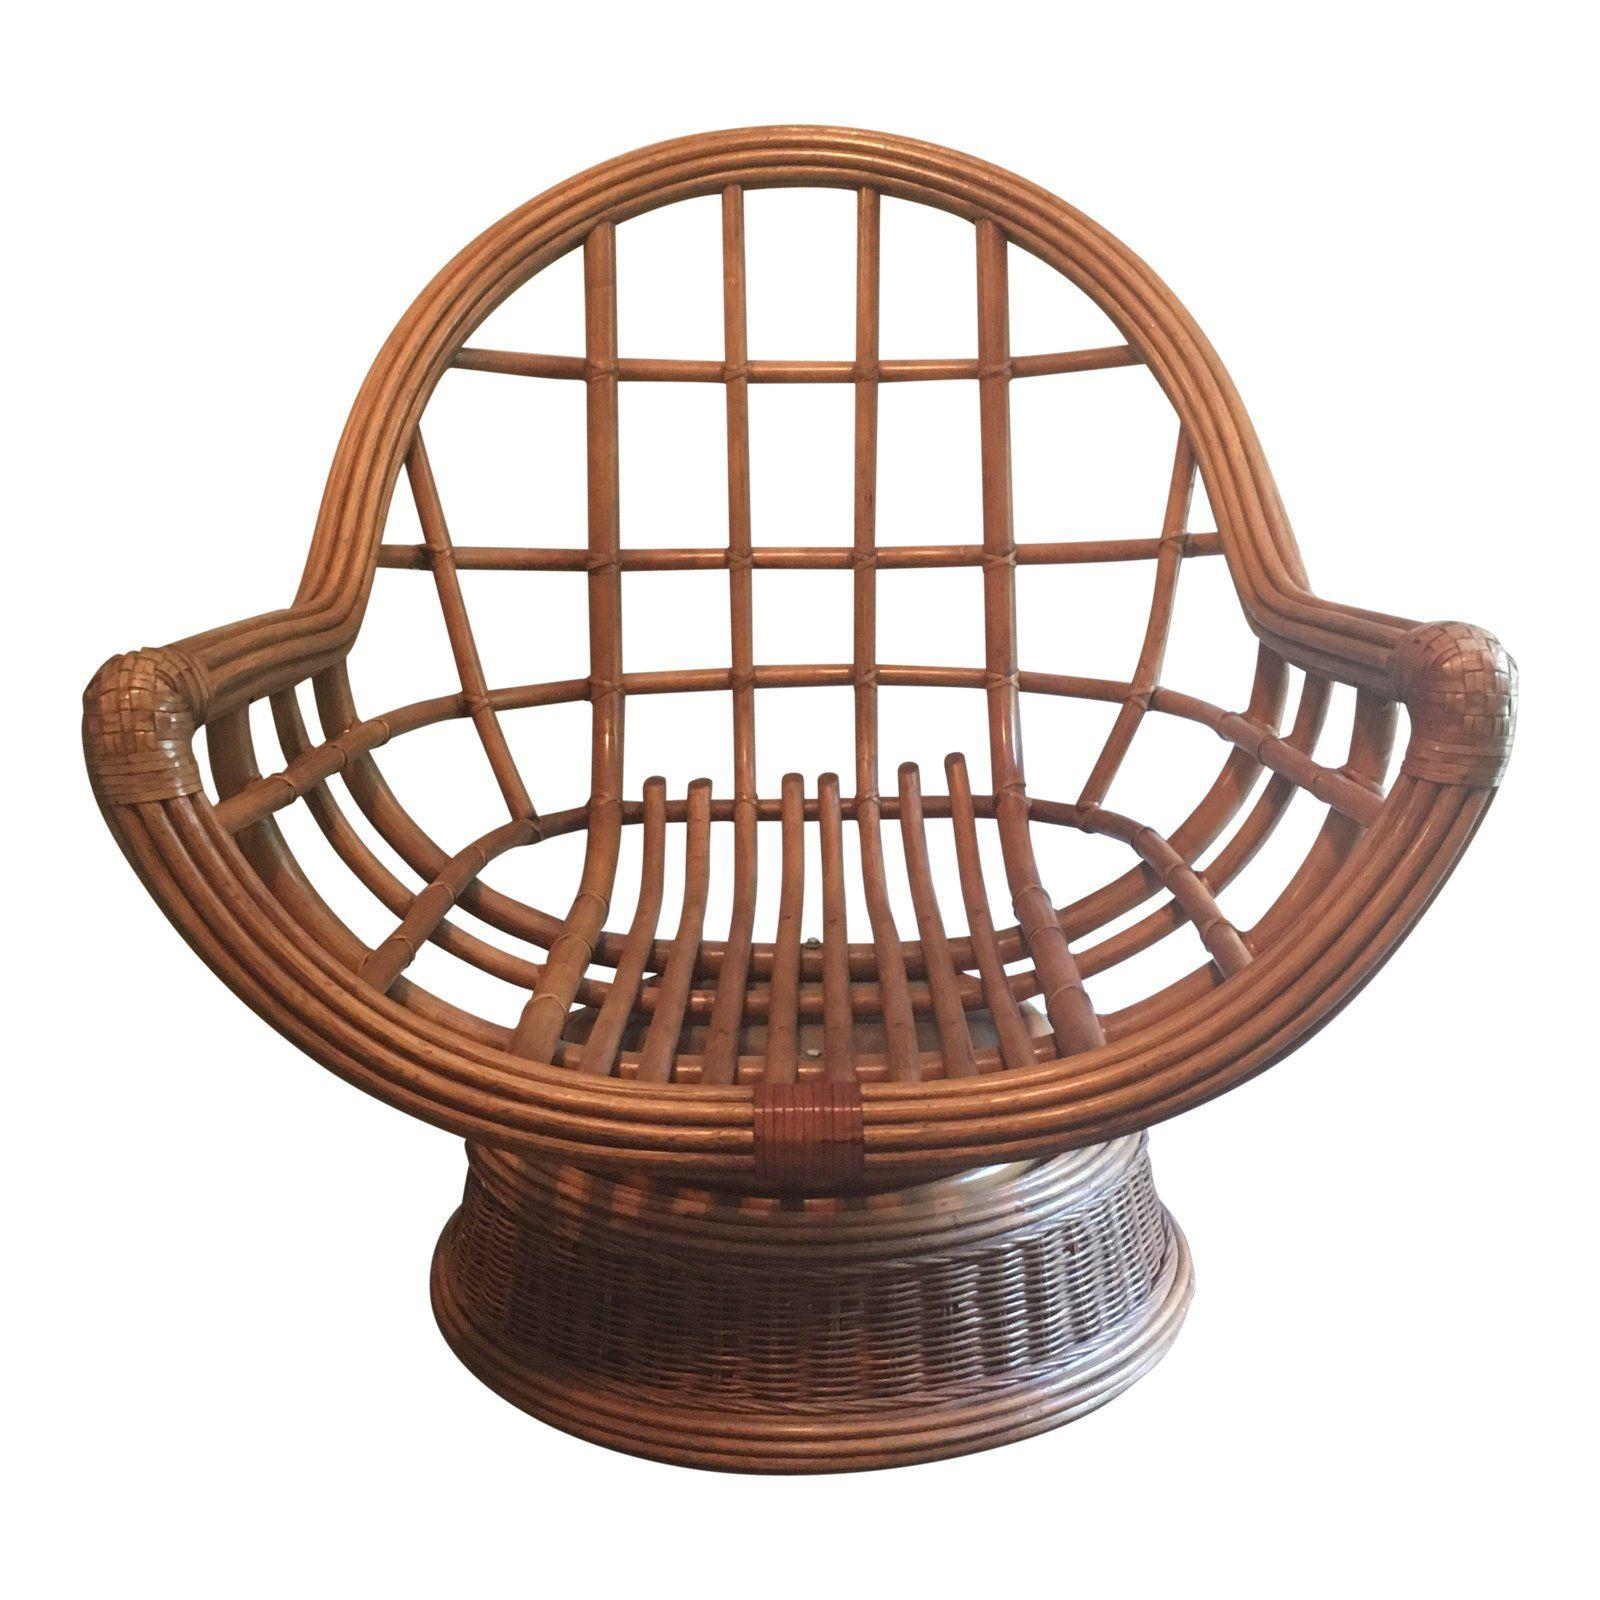 Mid Century Modern Rattan Swivel Chair Image 1 Of 8 Chair Rocking Chair Wicker Chair